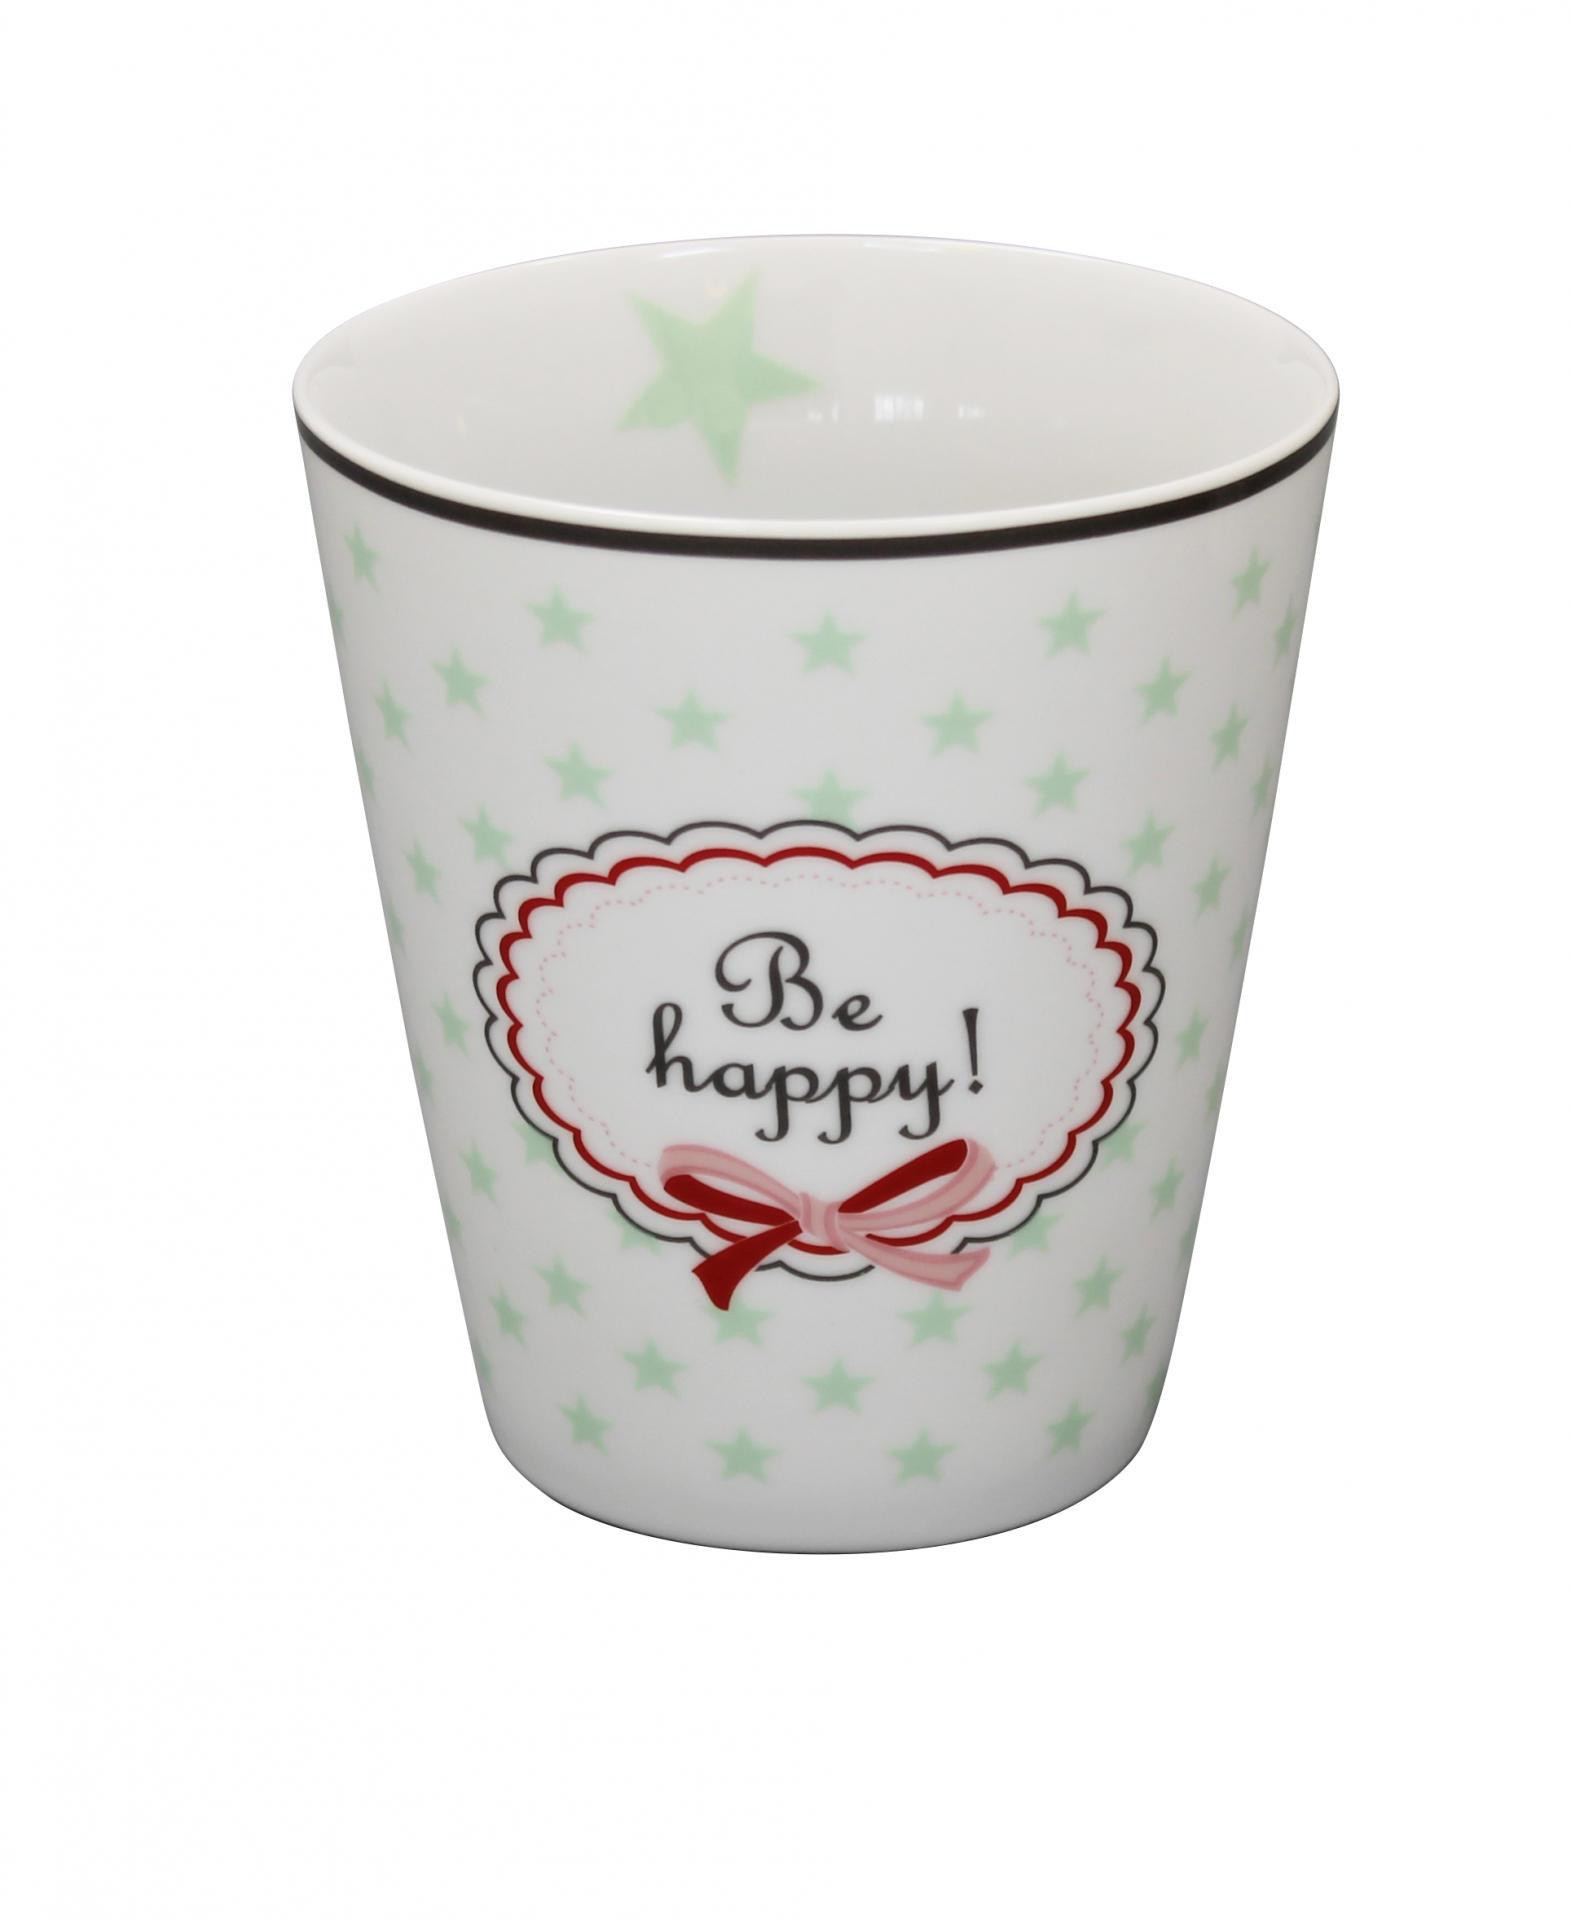 Krasilnikoff Hrneček Be happy white, zelená barva, porcelán